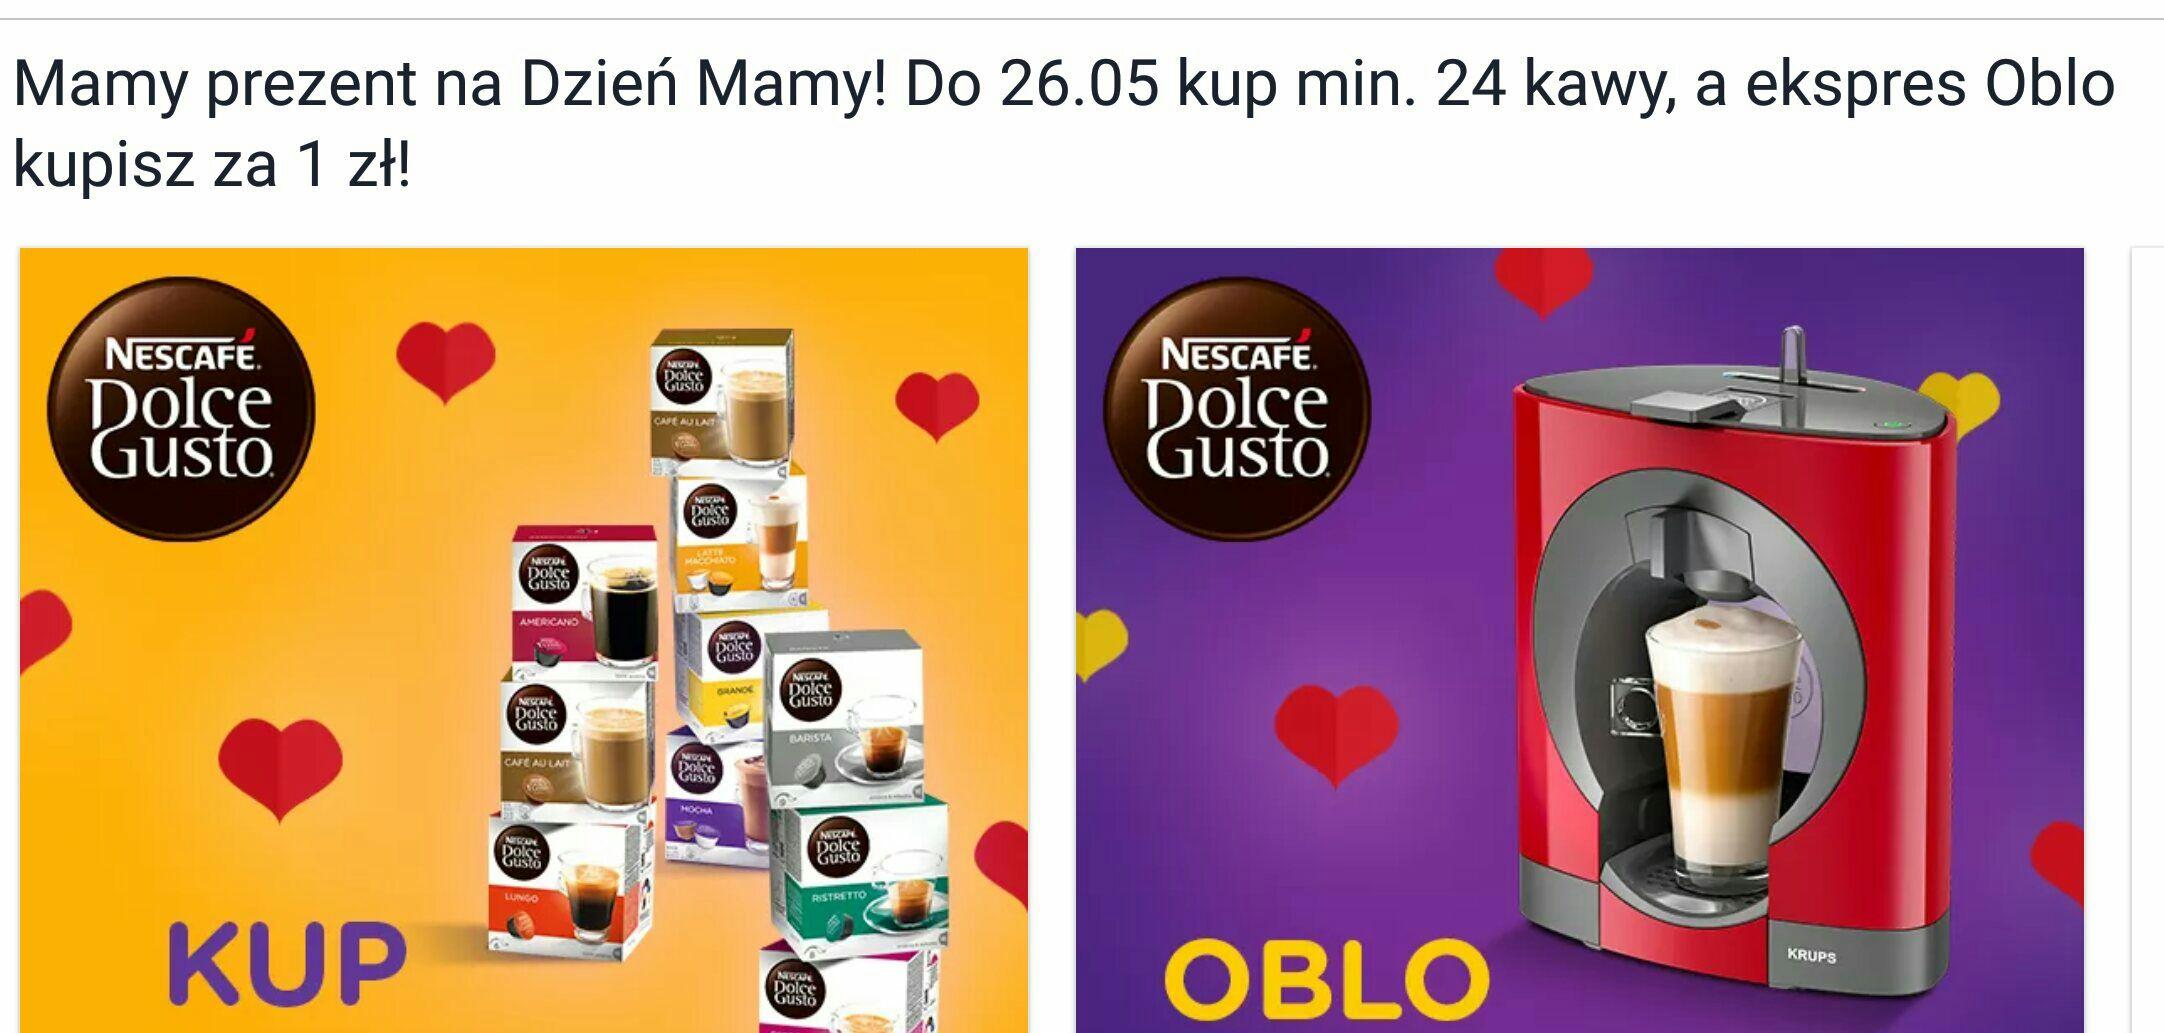 Do 26.05 kup min. 24 kawy, a ekspres Oblo kupisz za 1 zł!